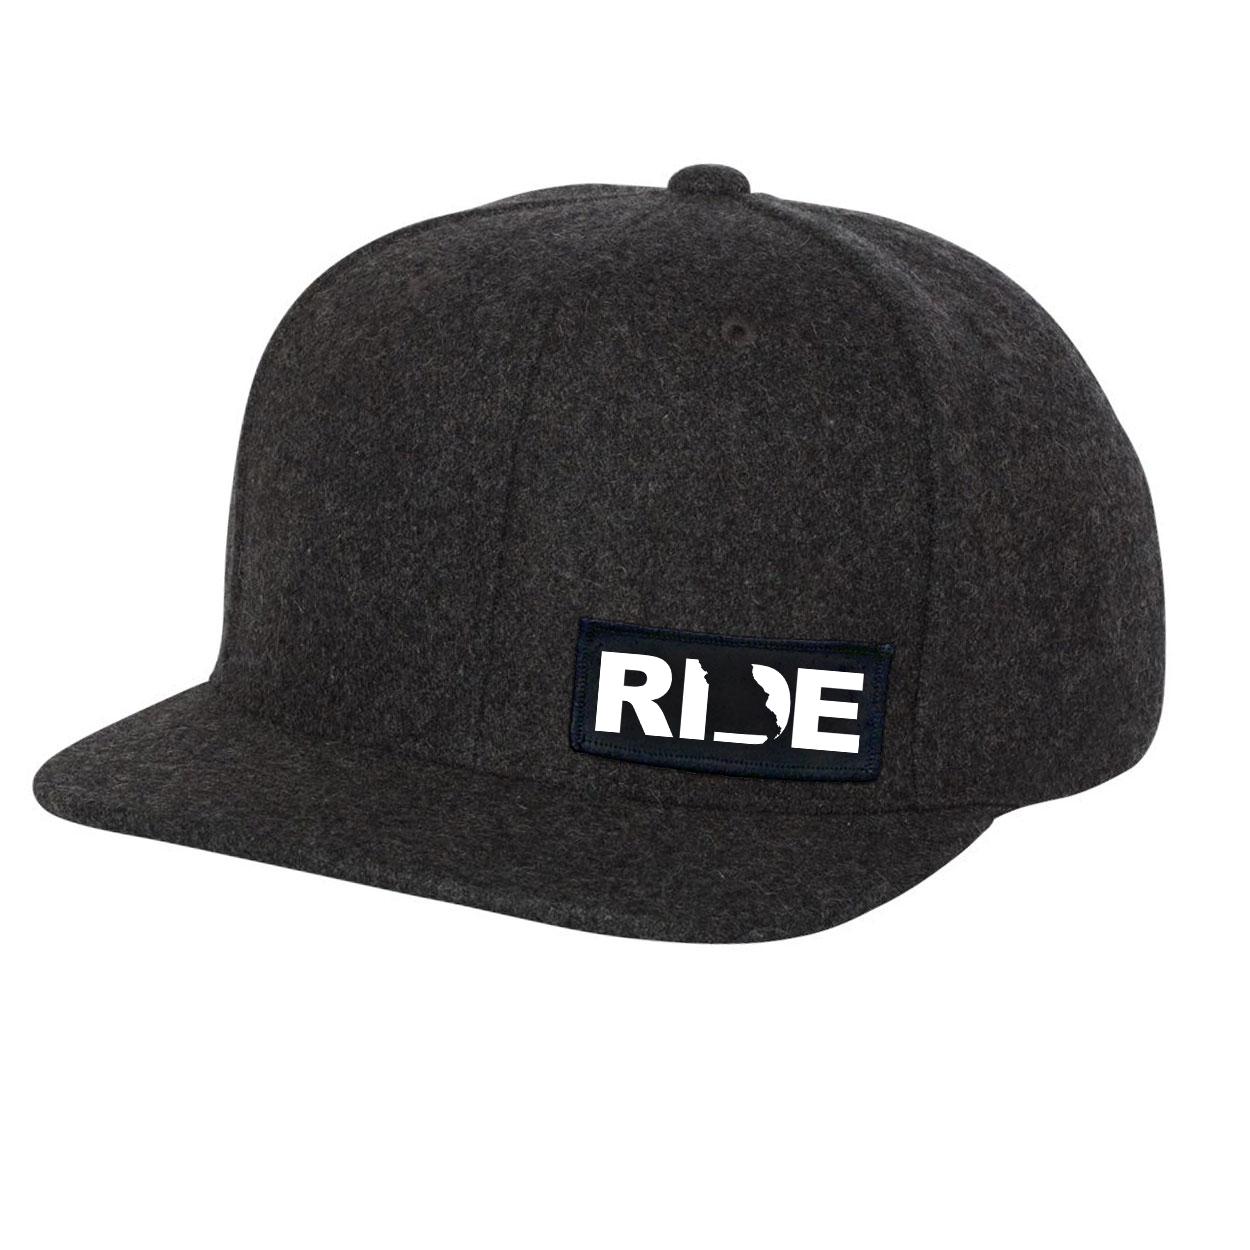 Ride Missouri Night Out Woven Patch Flat Brim Snapback Hat Dark Heather Gray Wool (White Logo)